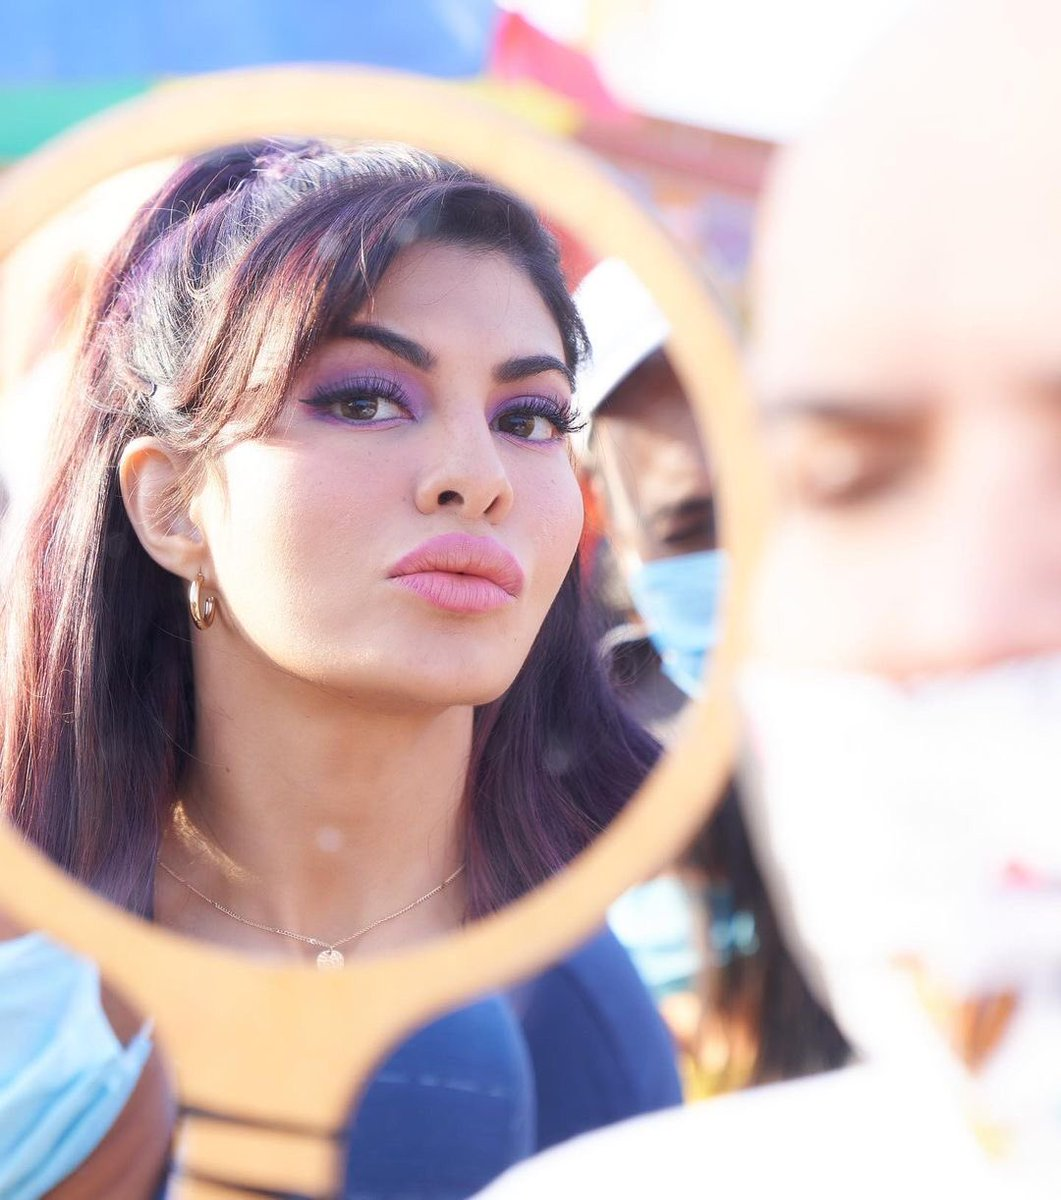 It's always super fun with you on sets! 🎬♥️   Waiting to see you play this beauty in #SajidNadiadwala's #BachchanPandey in cinemas on 26th Jan 💥  @Asli_Jacqueline @farhad_samji @WardaNadiadwala